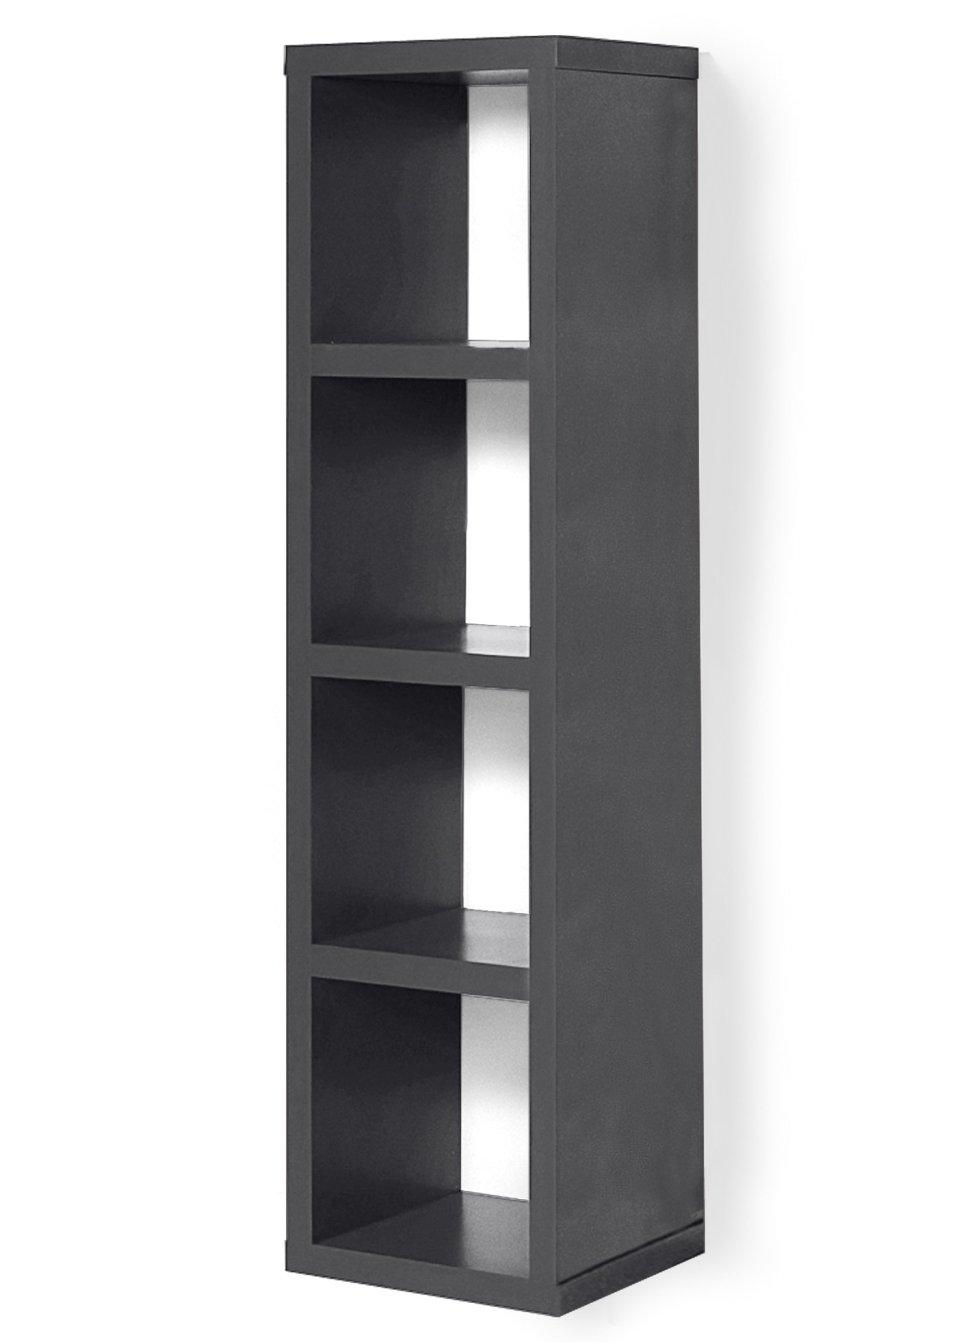 allesk nner in w rfelform regal kenia 4 f cher anthrazit mit 4 f chern. Black Bedroom Furniture Sets. Home Design Ideas